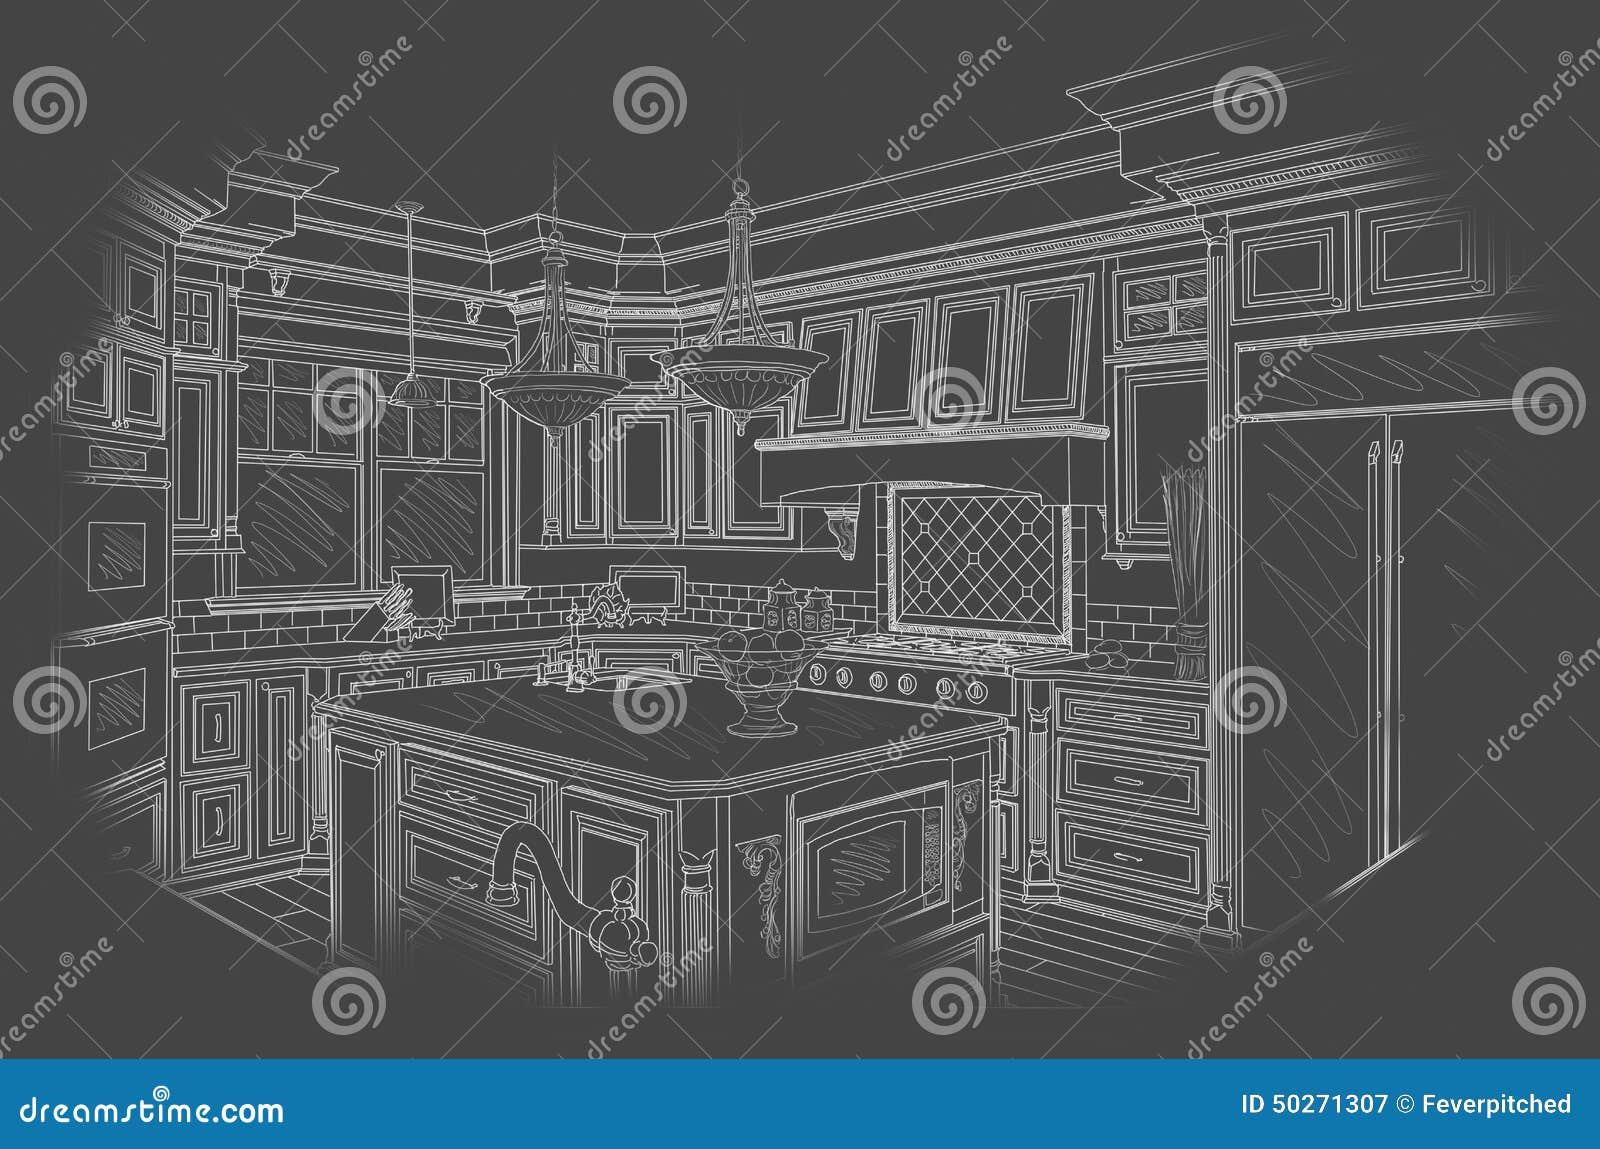 White Custom Kitchen Design Drawing on Grey